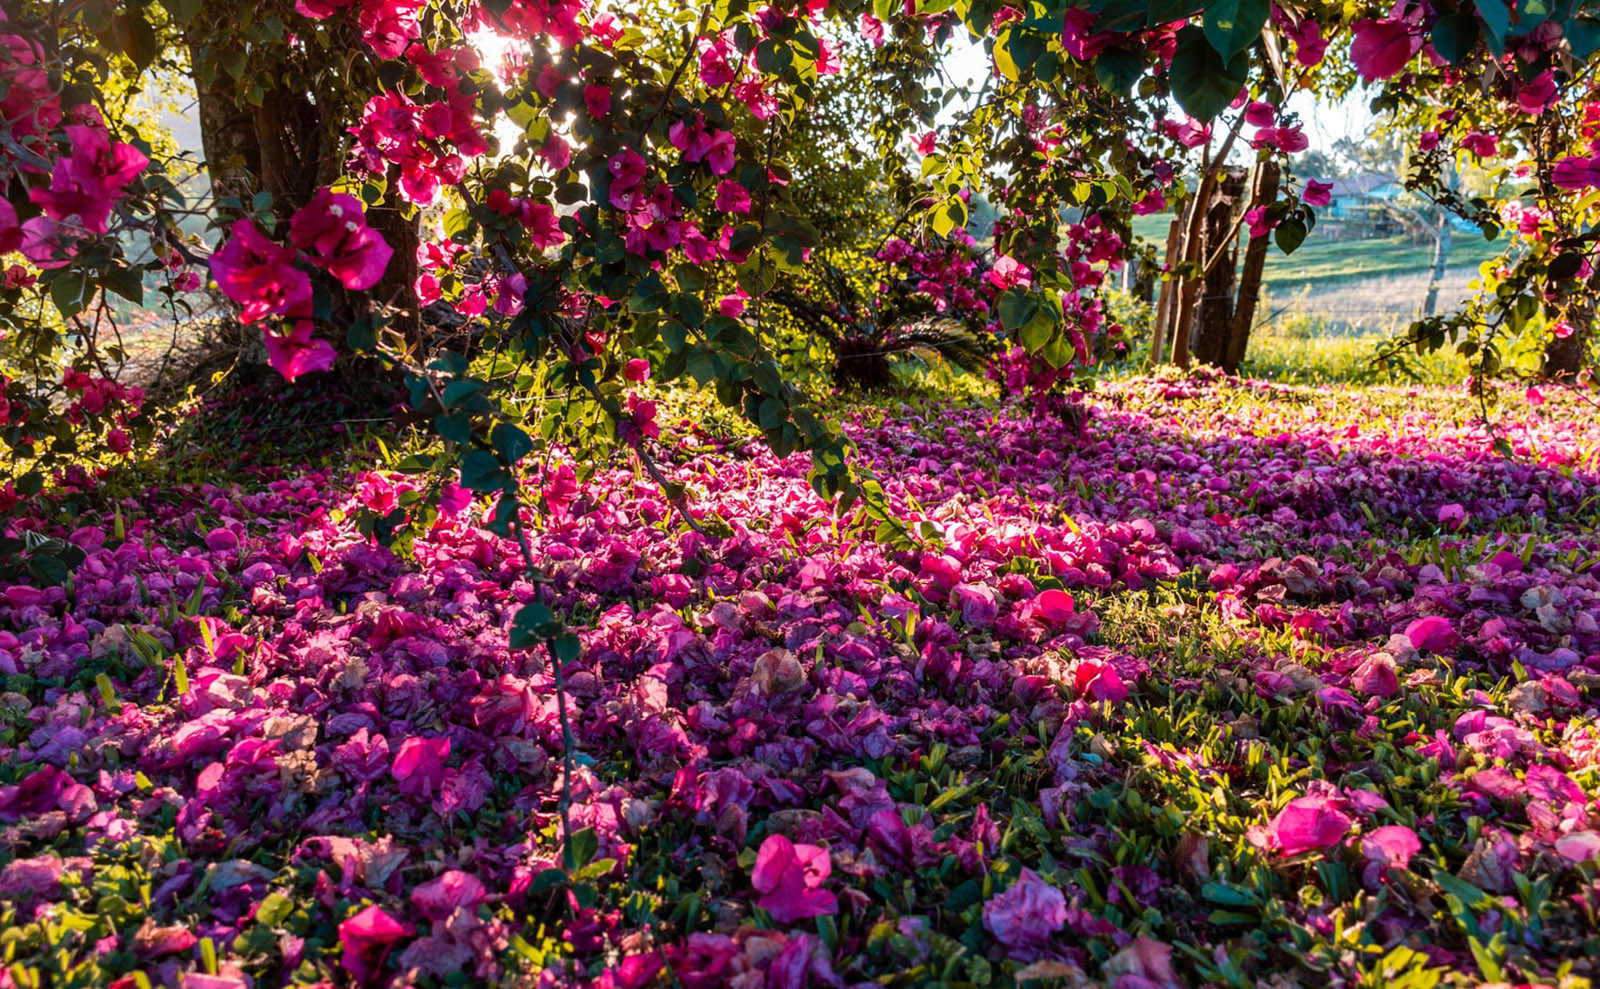 pink flowers in forquetinha, brazil